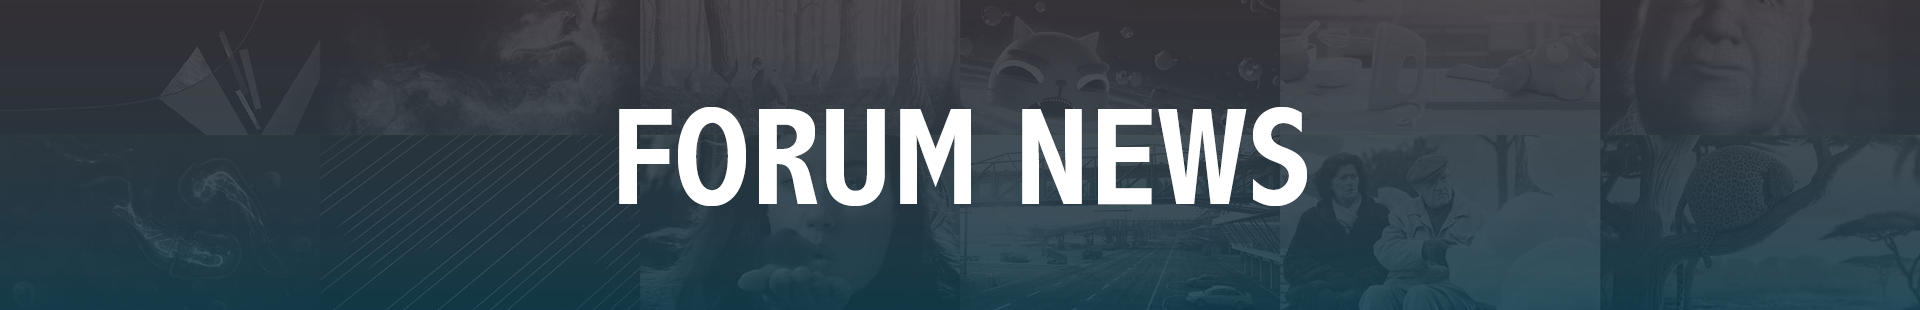 Forum News